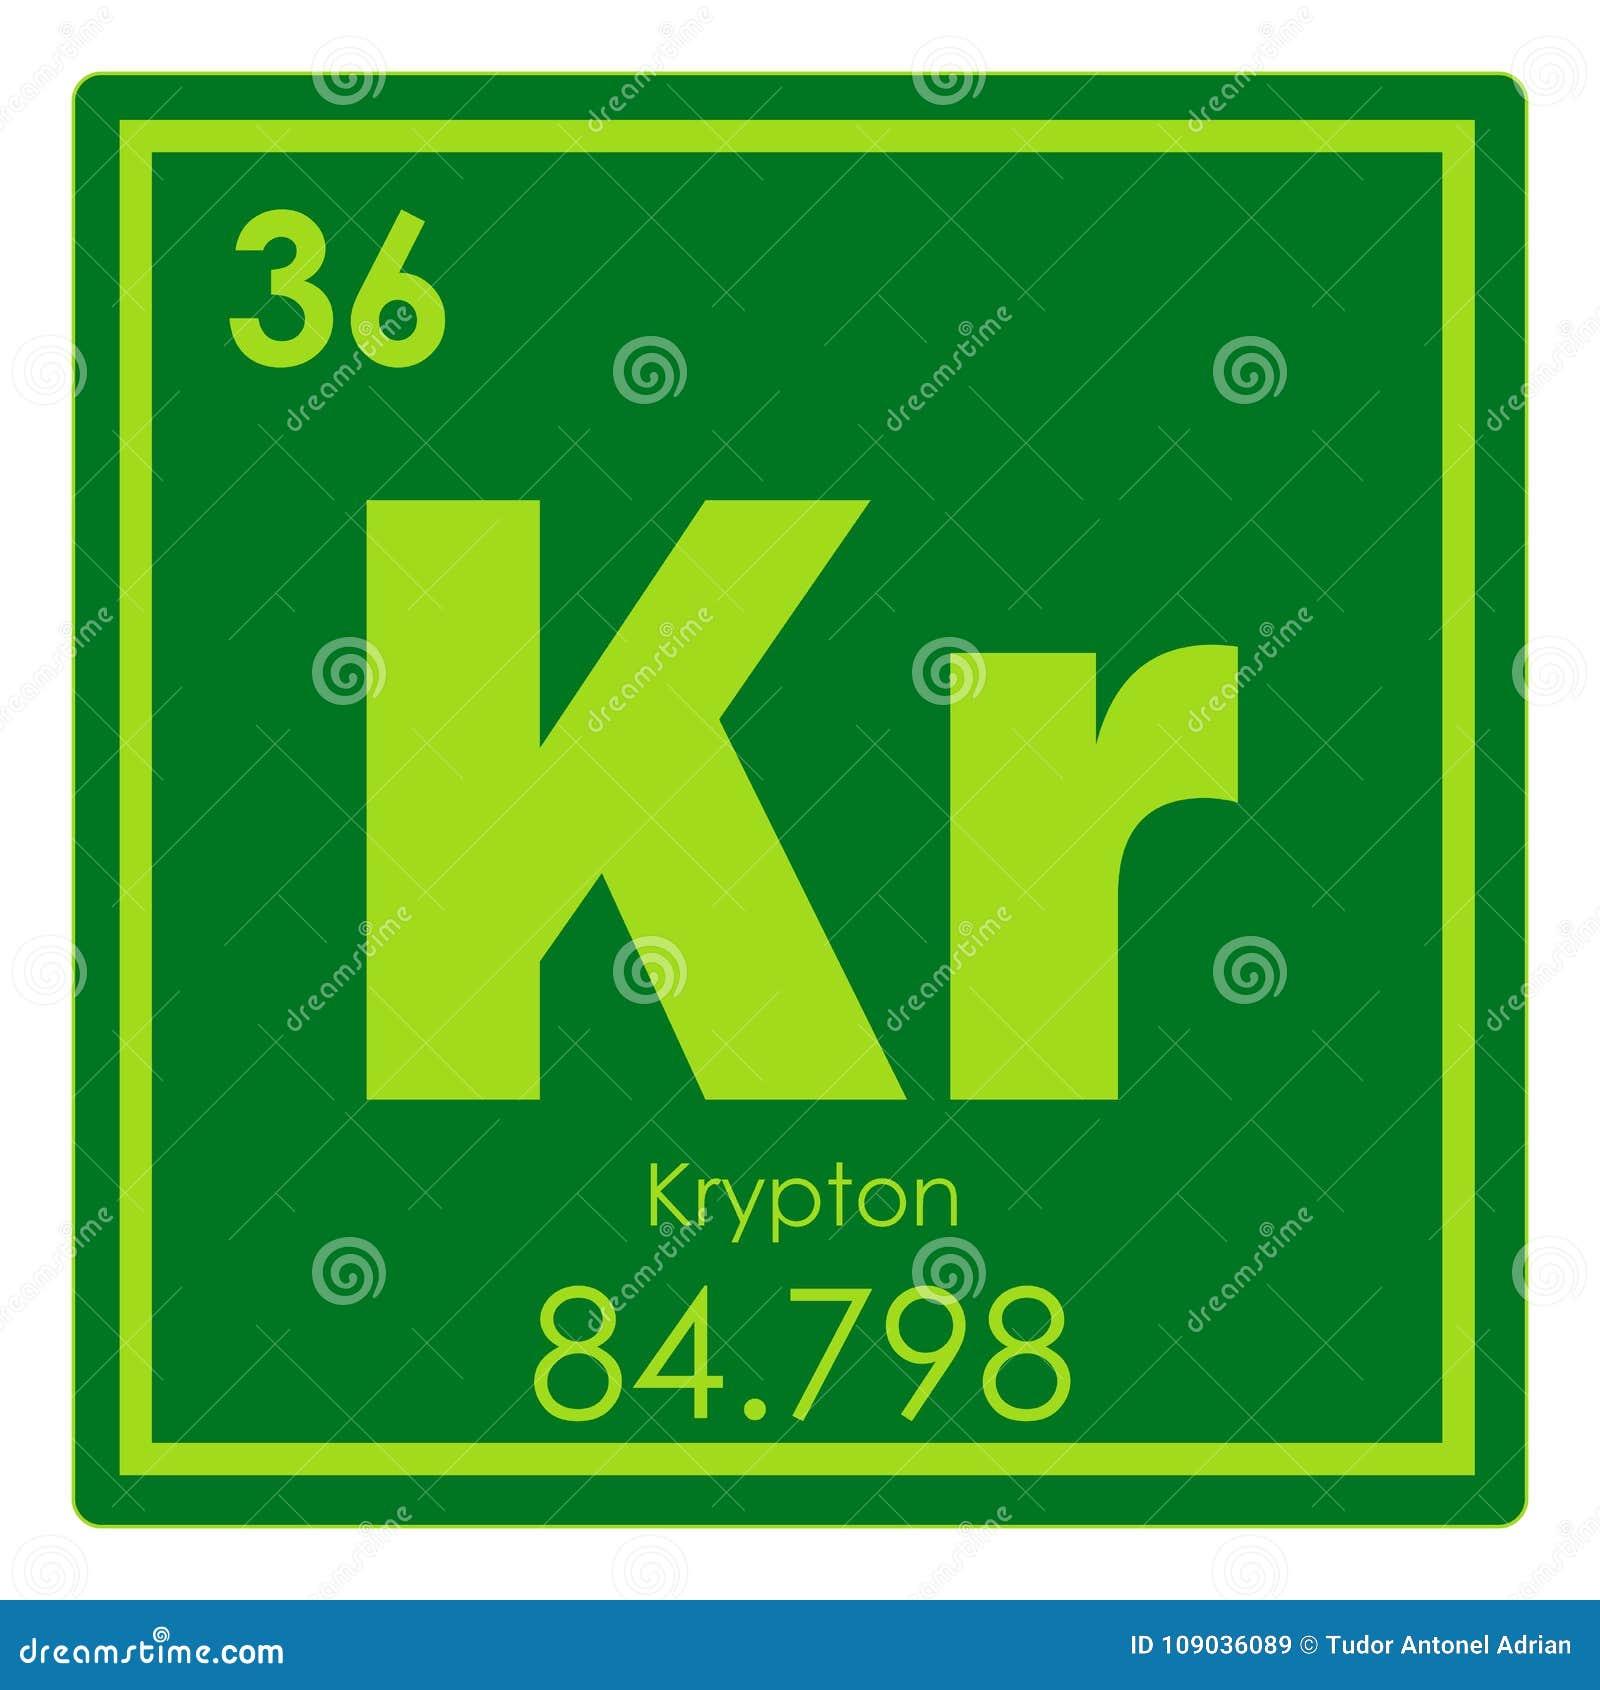 Krypton chemical element stock illustration illustration of geek krypton chemical element urtaz Choice Image